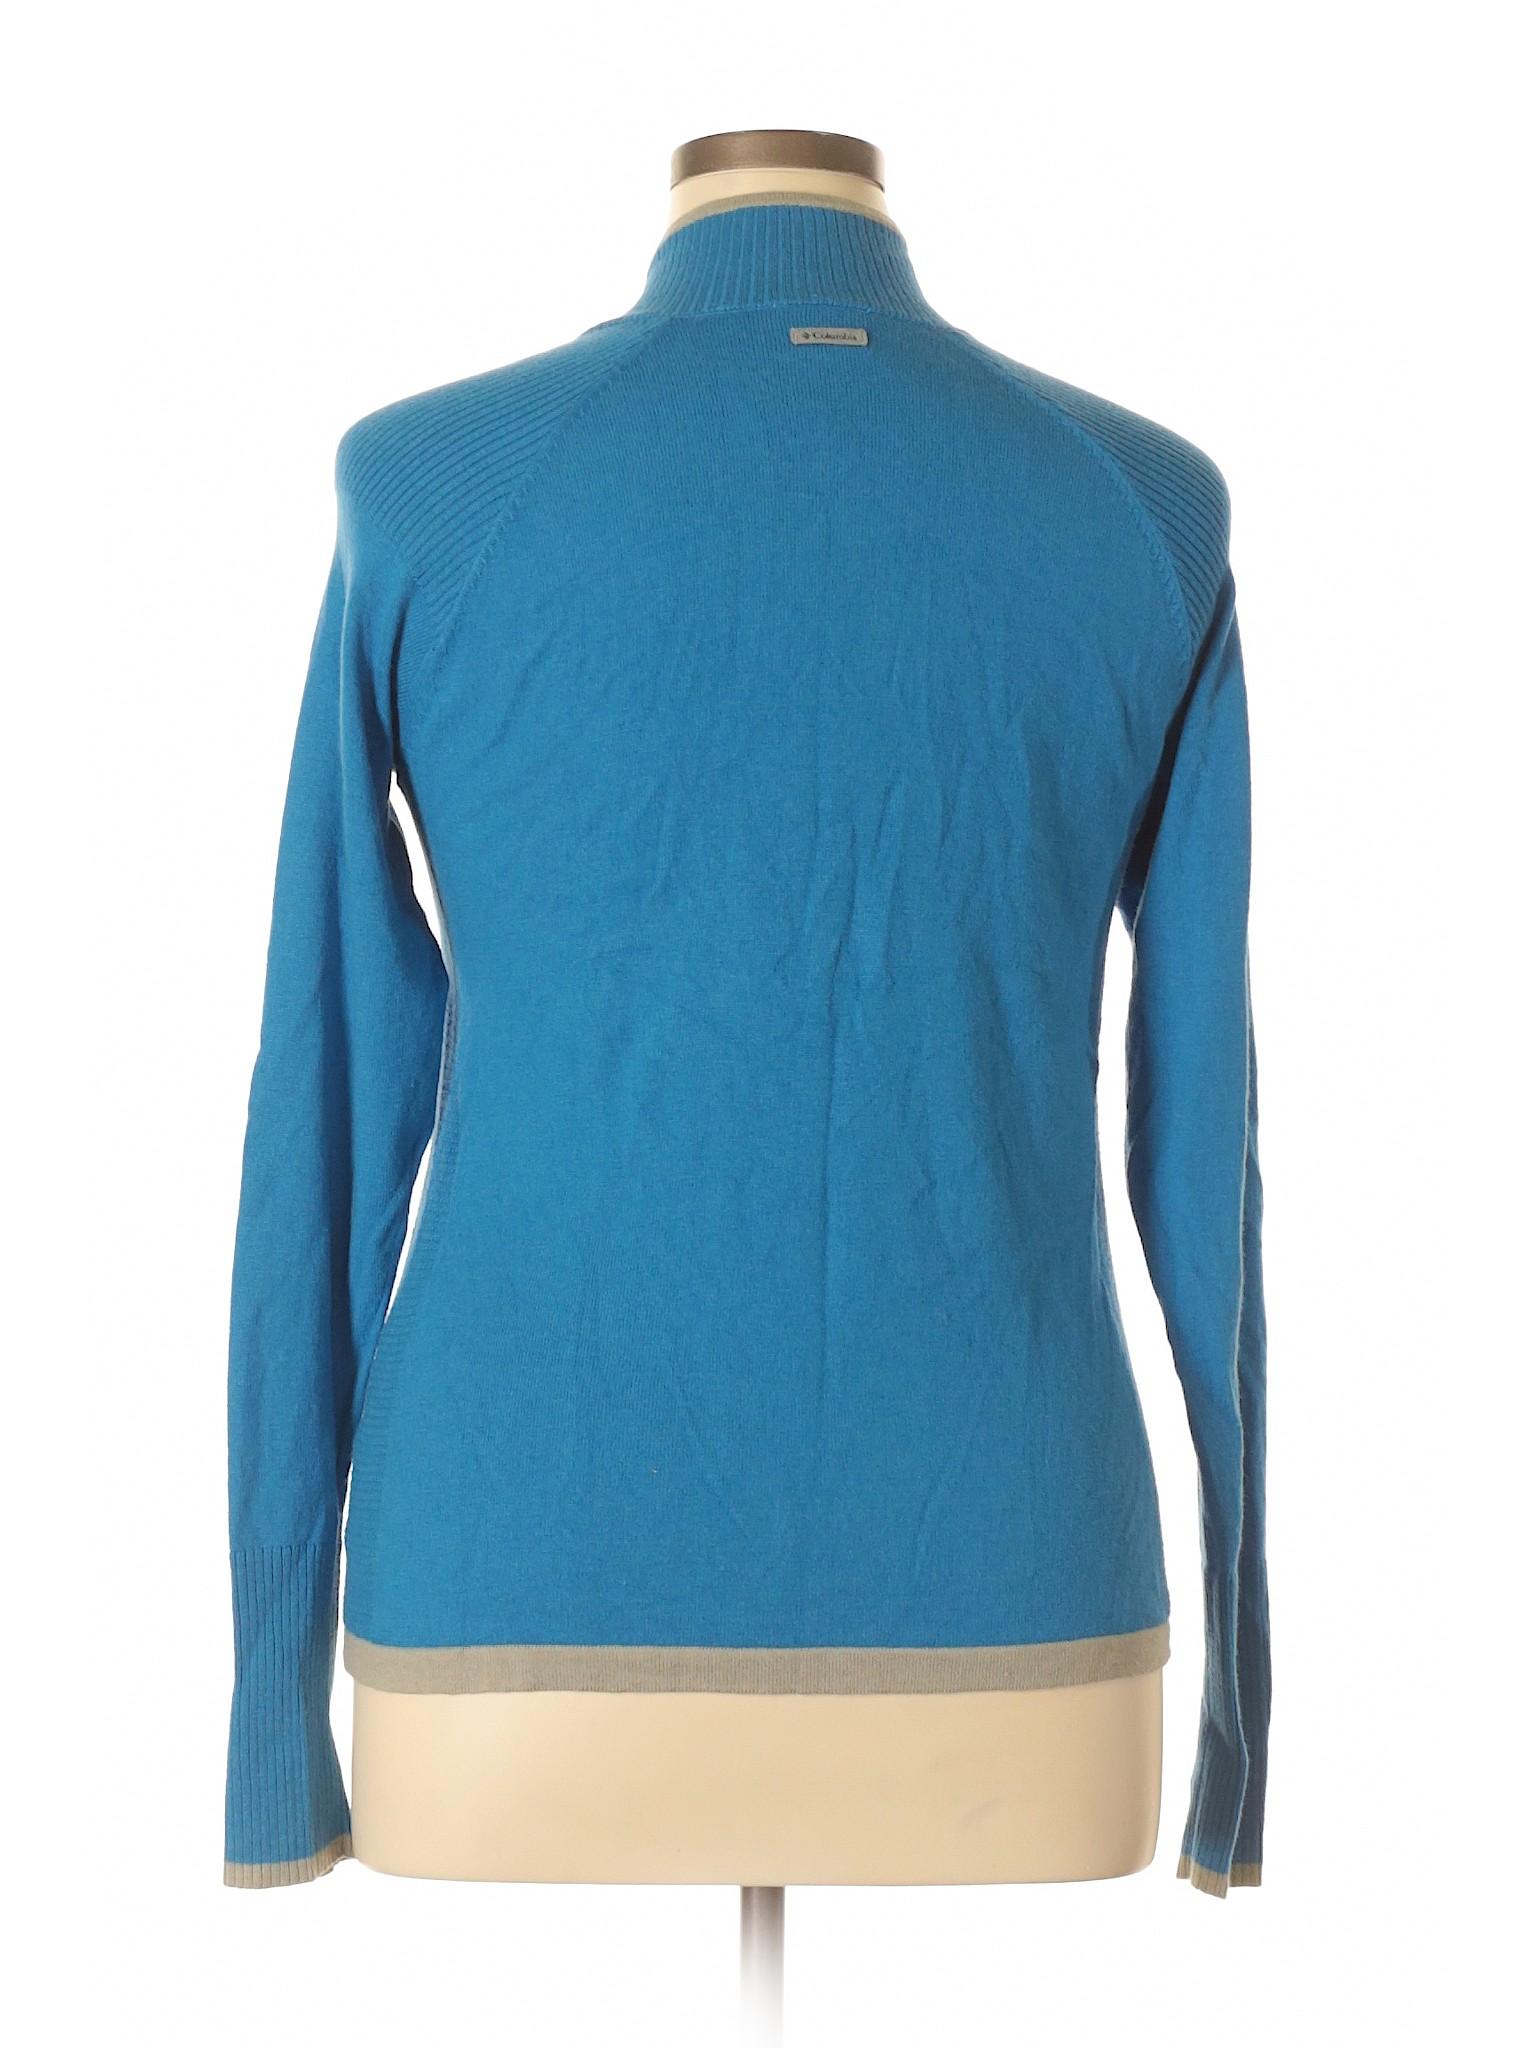 Boutique winter winter Pullover Columbia Columbia Sweater Boutique x6twwnE